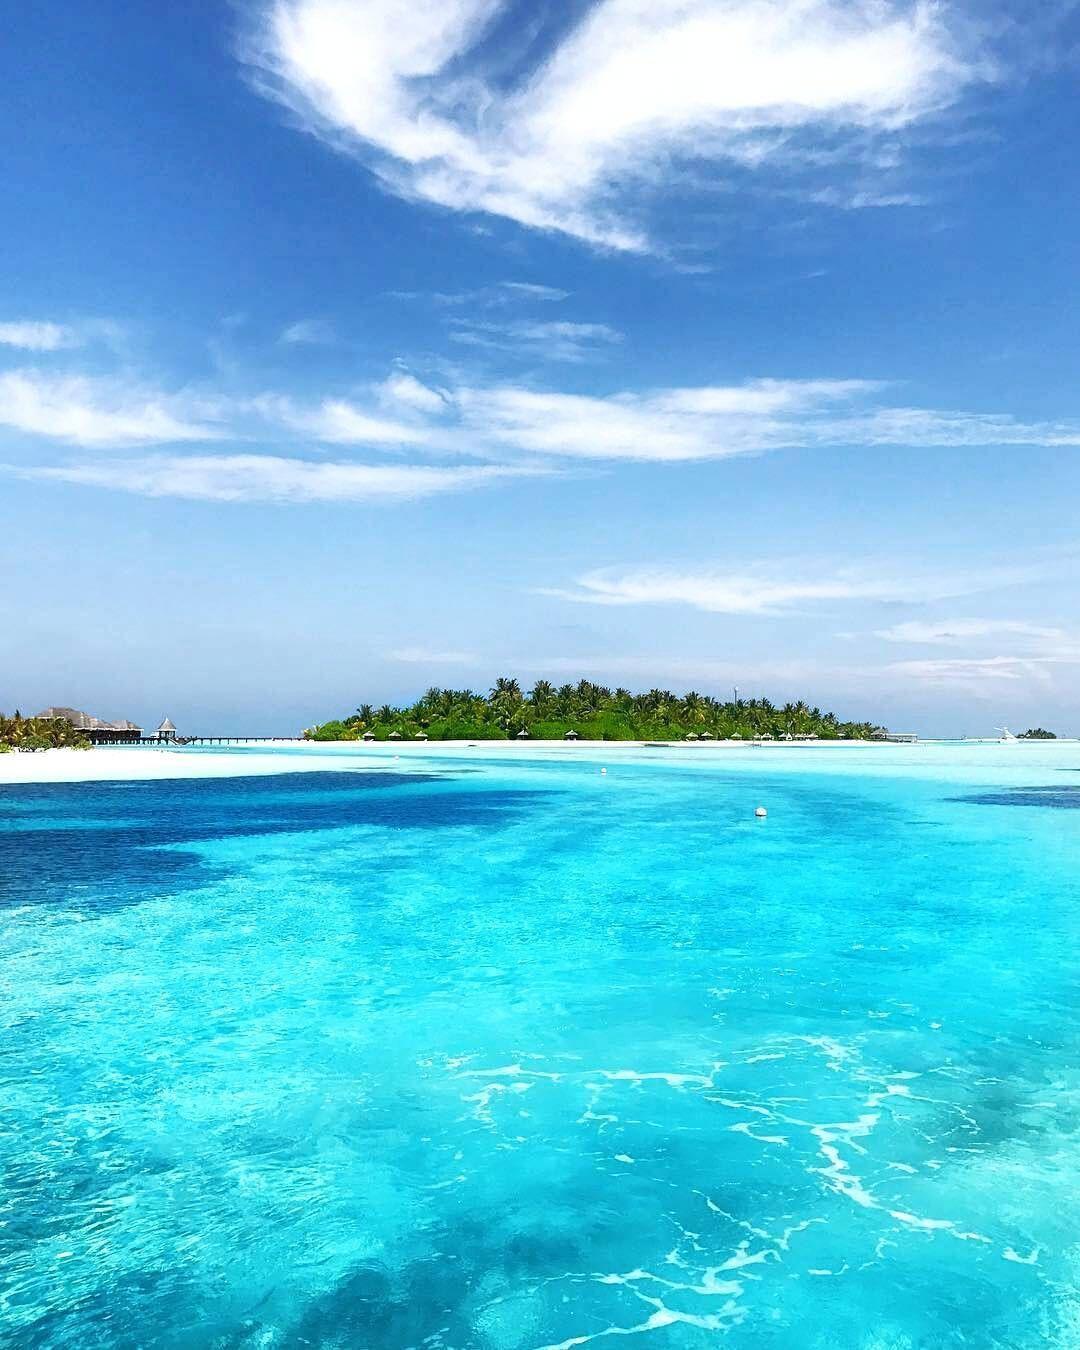 Maldives Beach: Pin By MAD Designs On Beaches